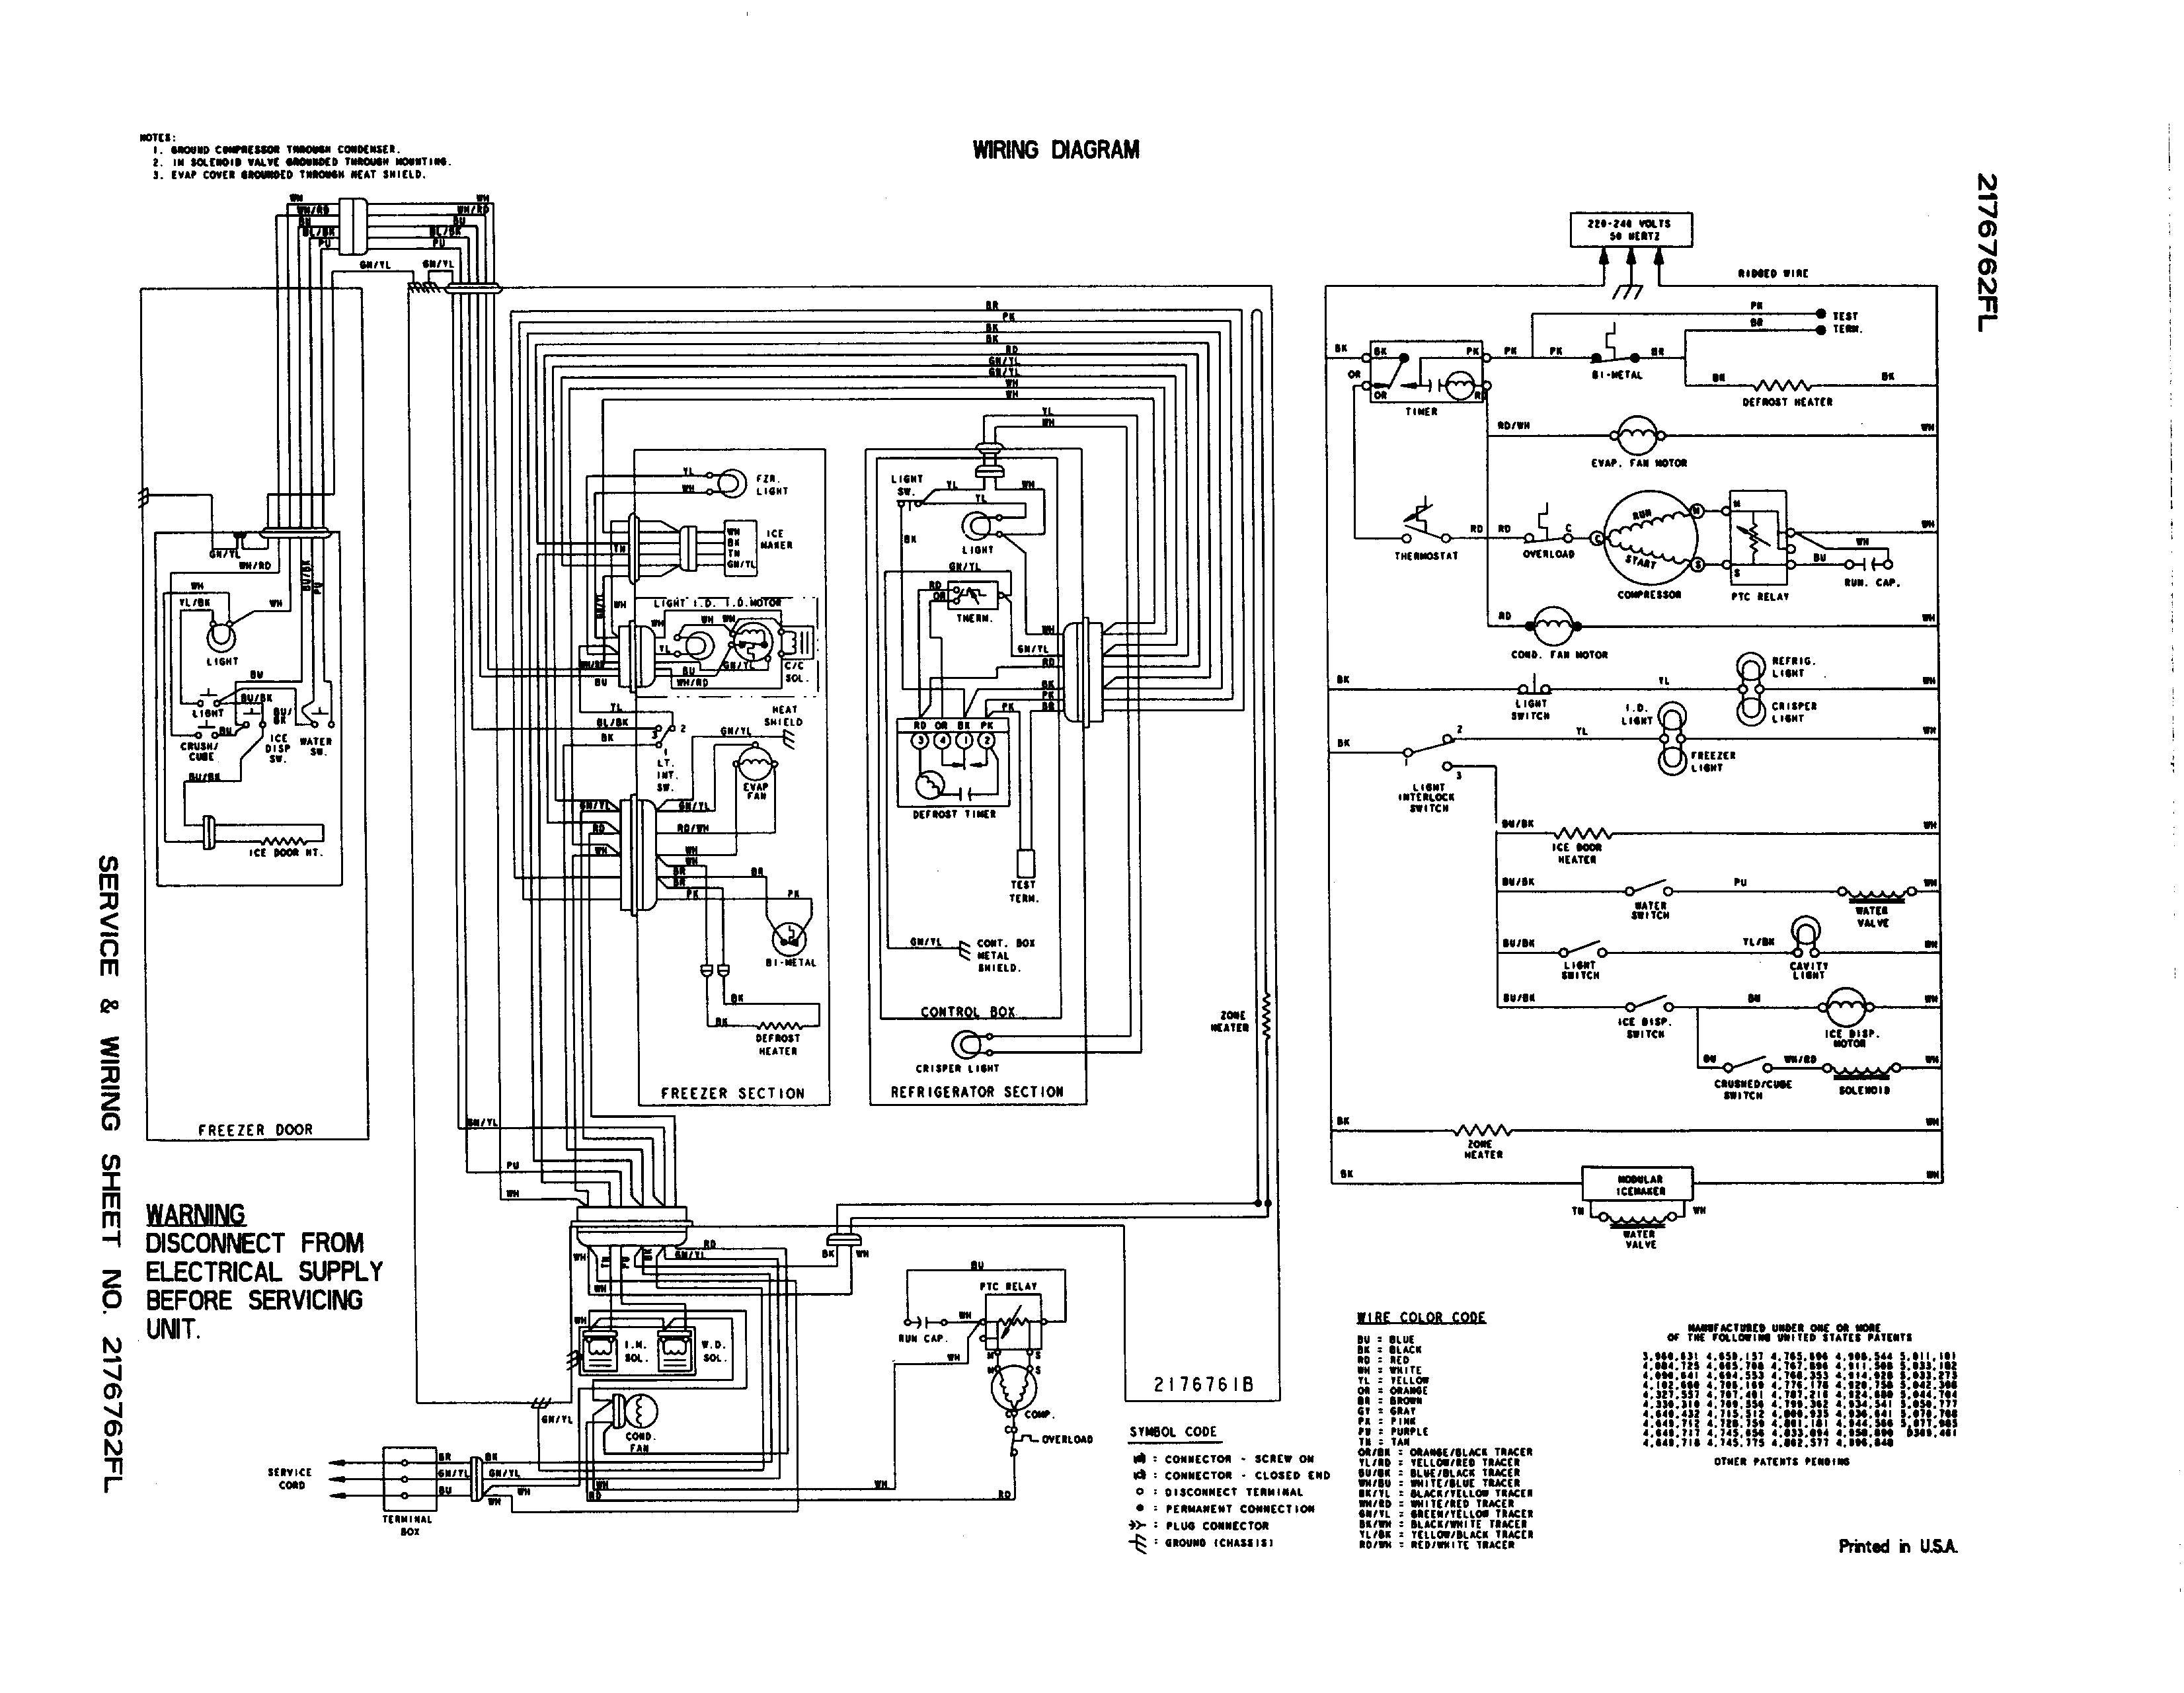 John Deere 4020 Starter Wiring Diagram John Deere 455 Wiring Diagram Lorestanfo Of John Deere 4020 Starter Wiring Diagram